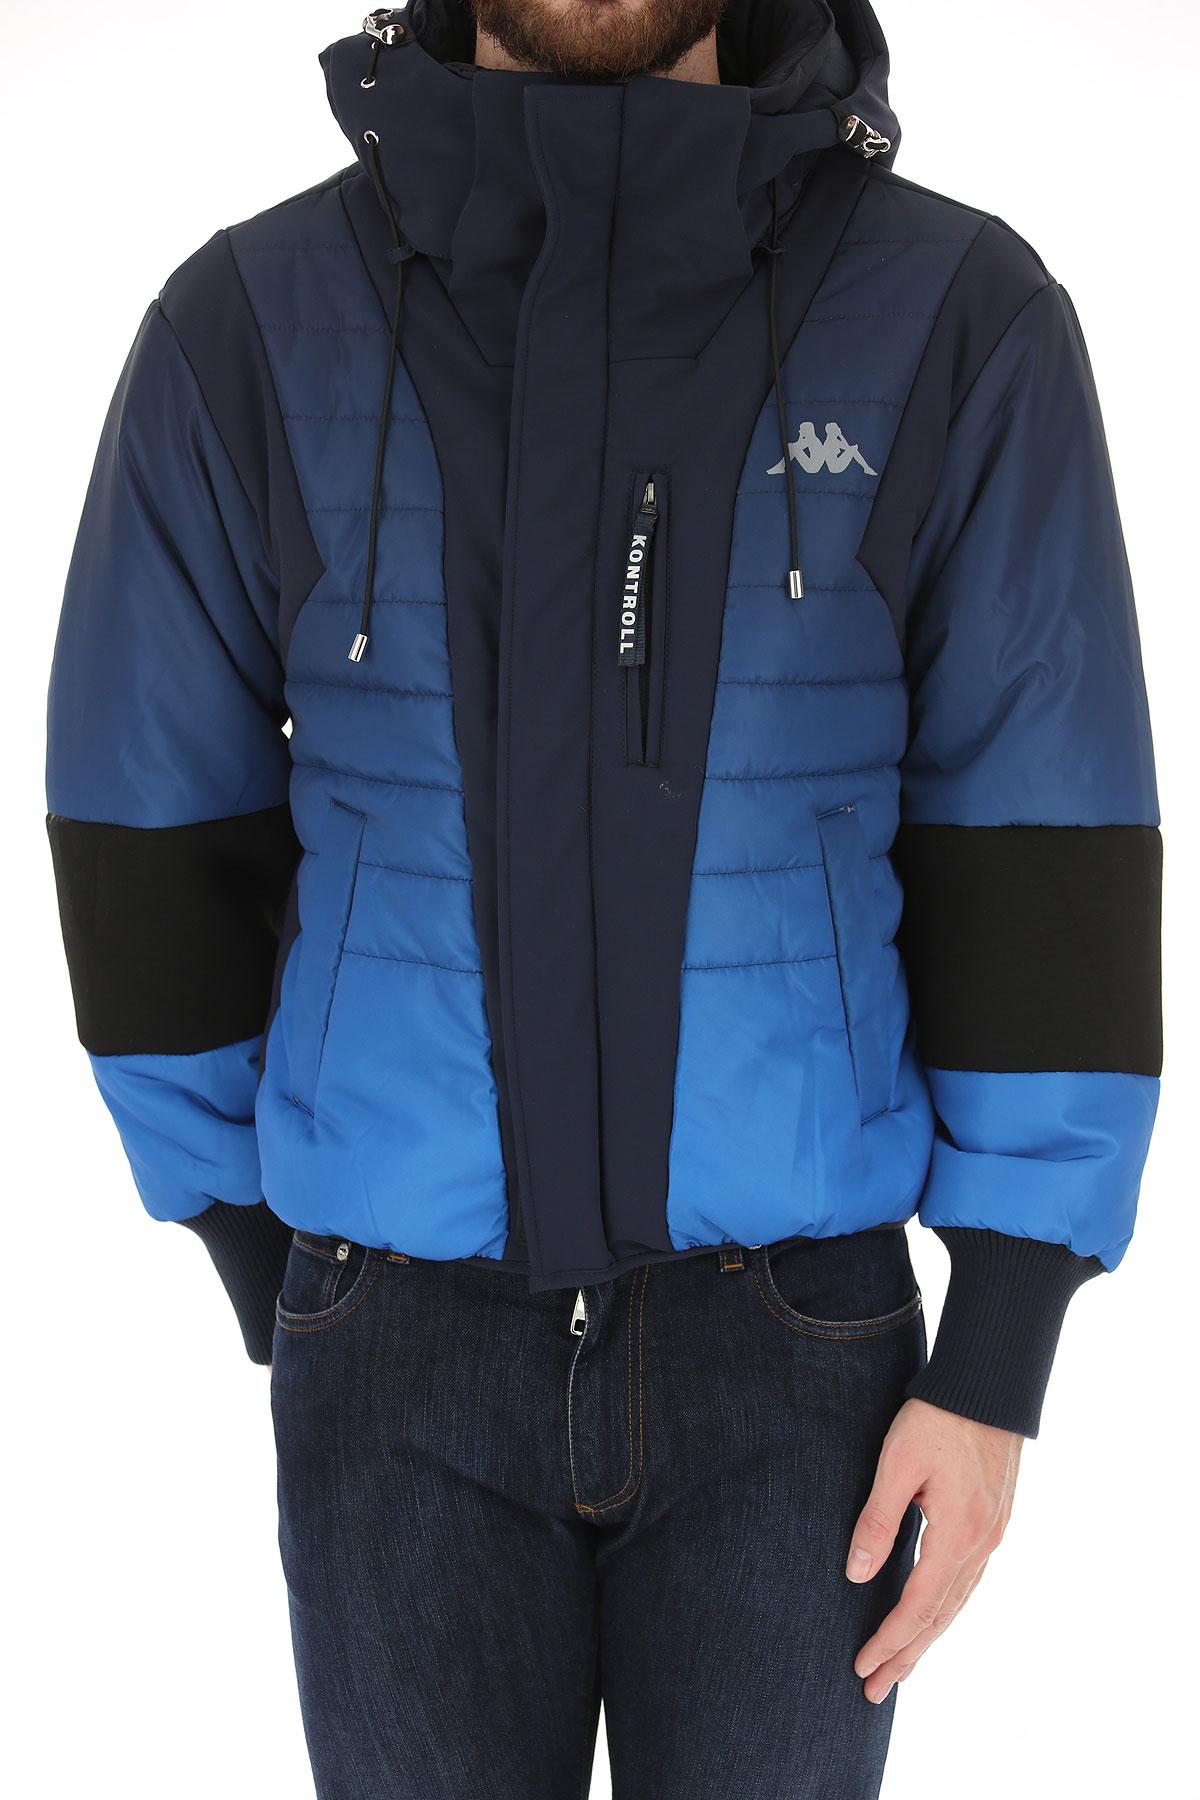 2018 invierno Azul Para Ropa 19 Brillante Hombres Claro Kappa Kontroll Marino Otoño W8RYnqnXx